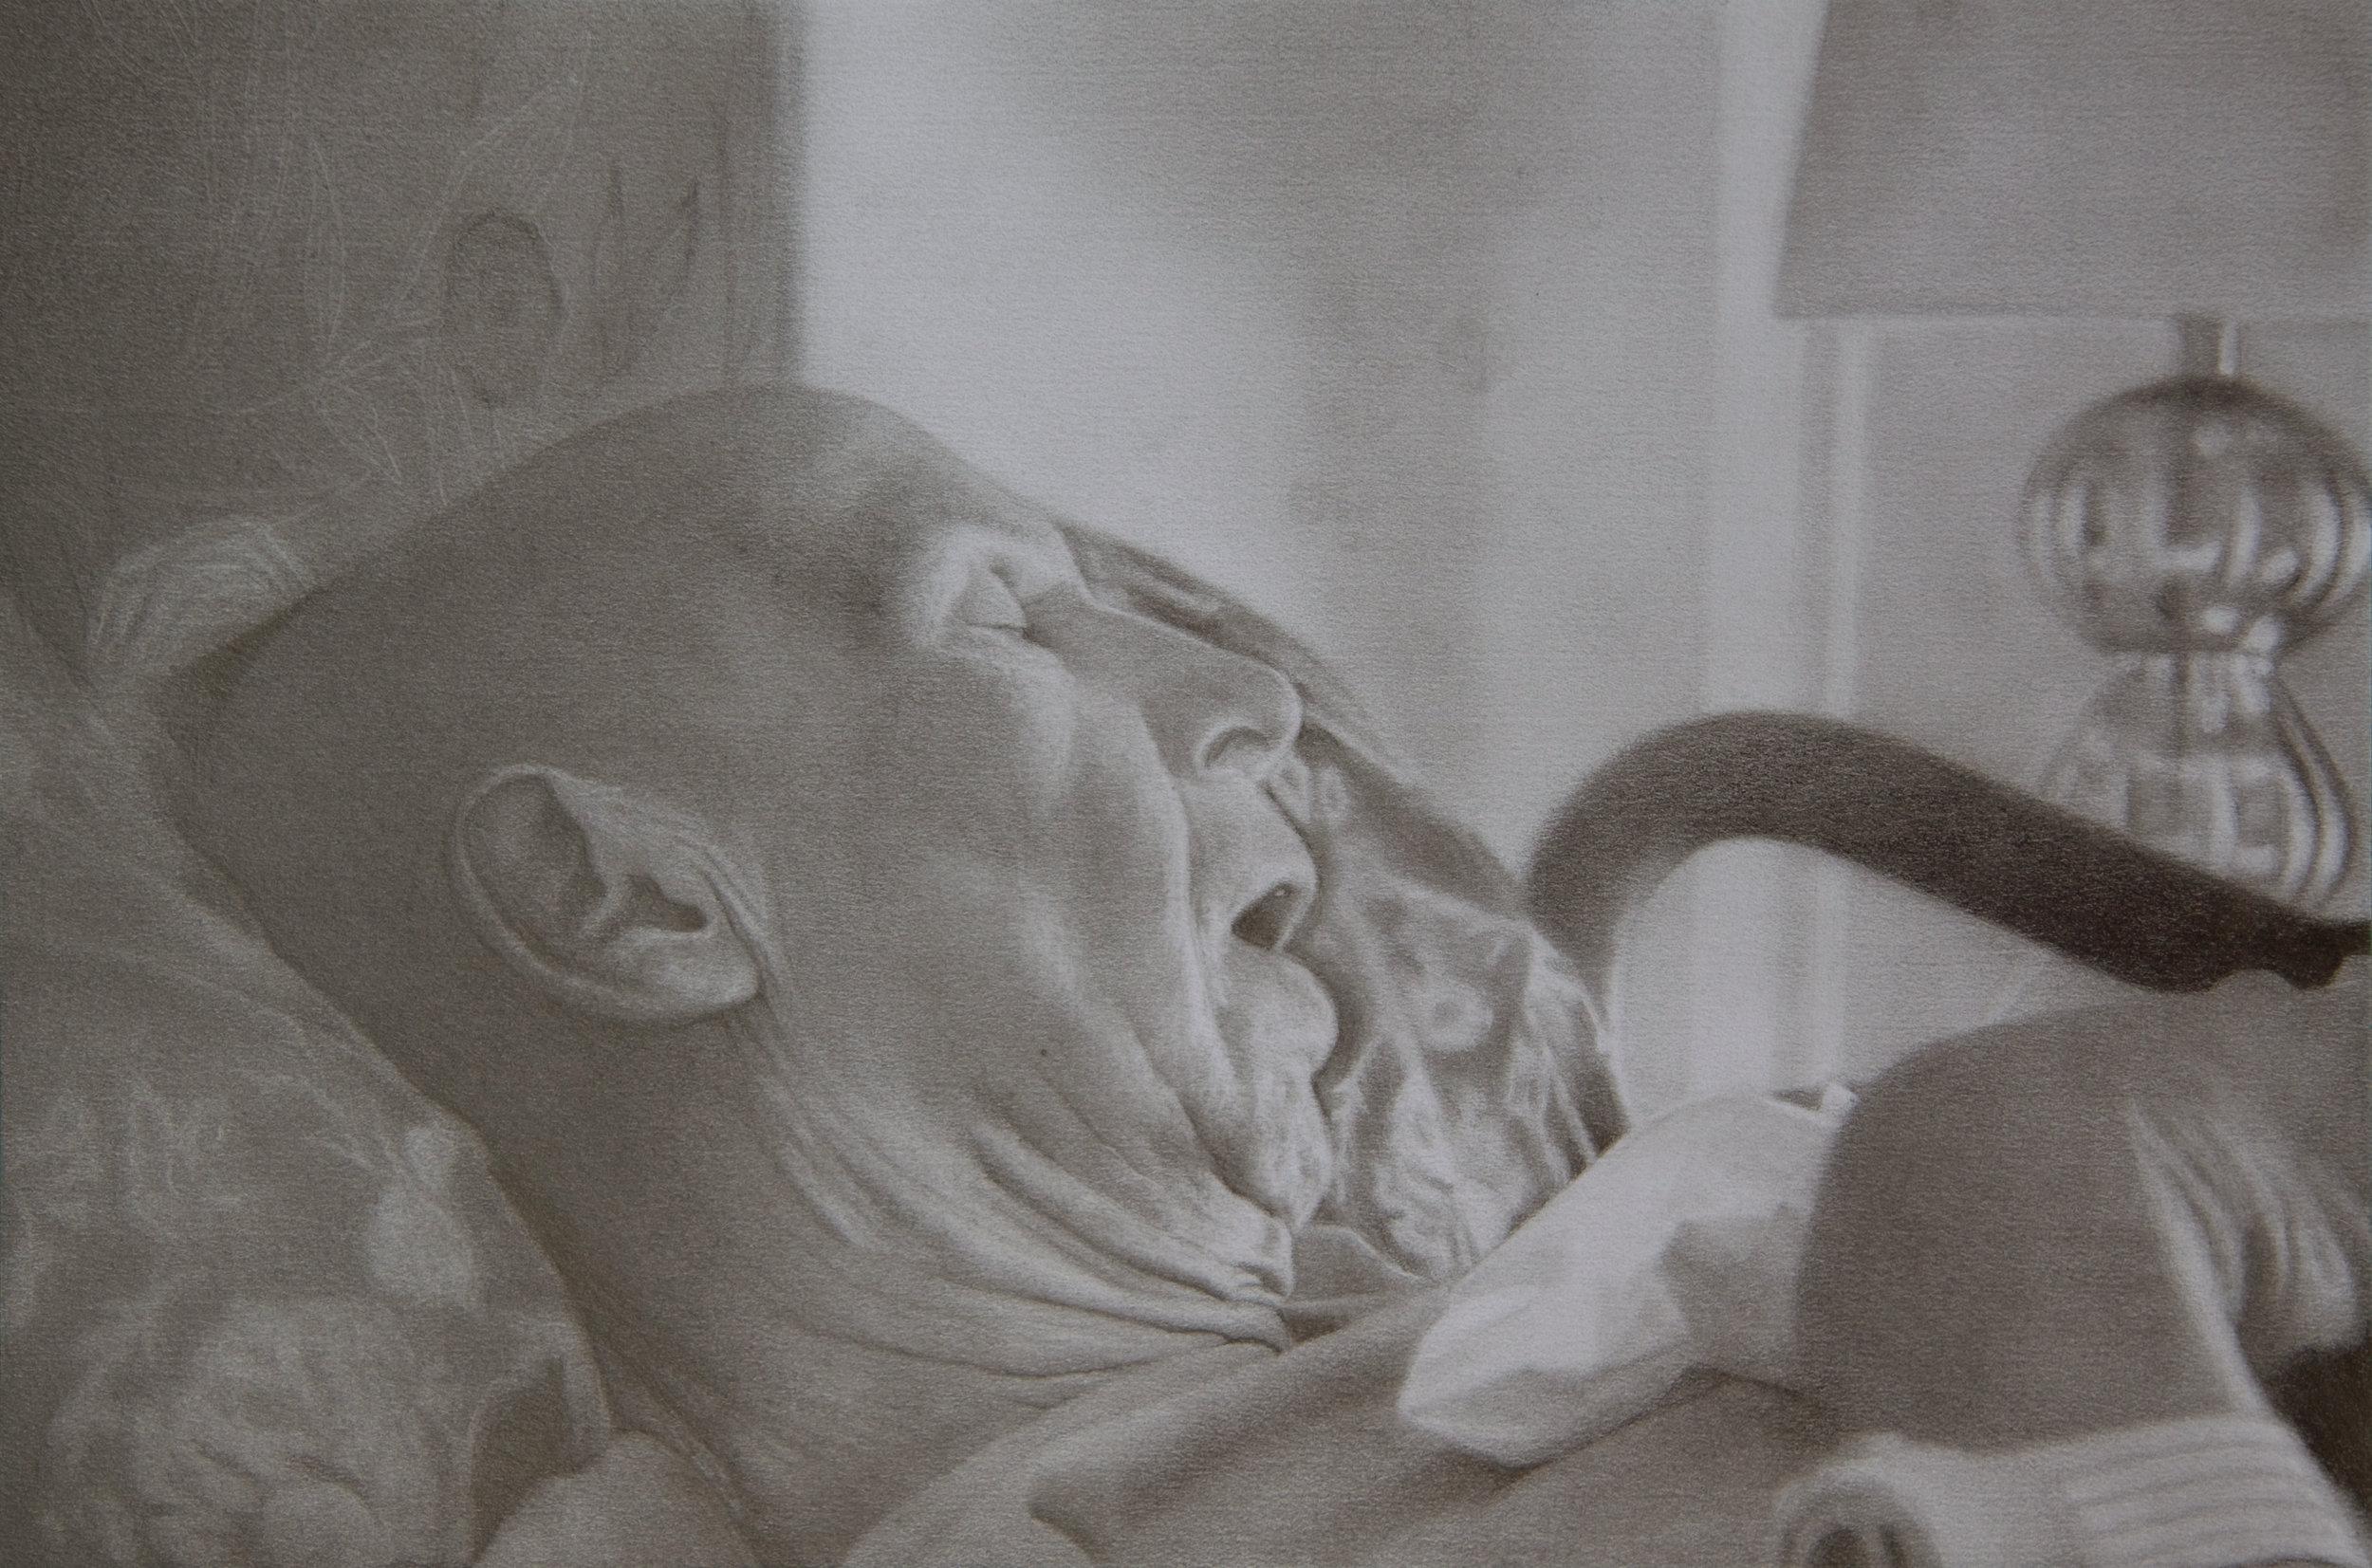 Untitled (Sleeping)